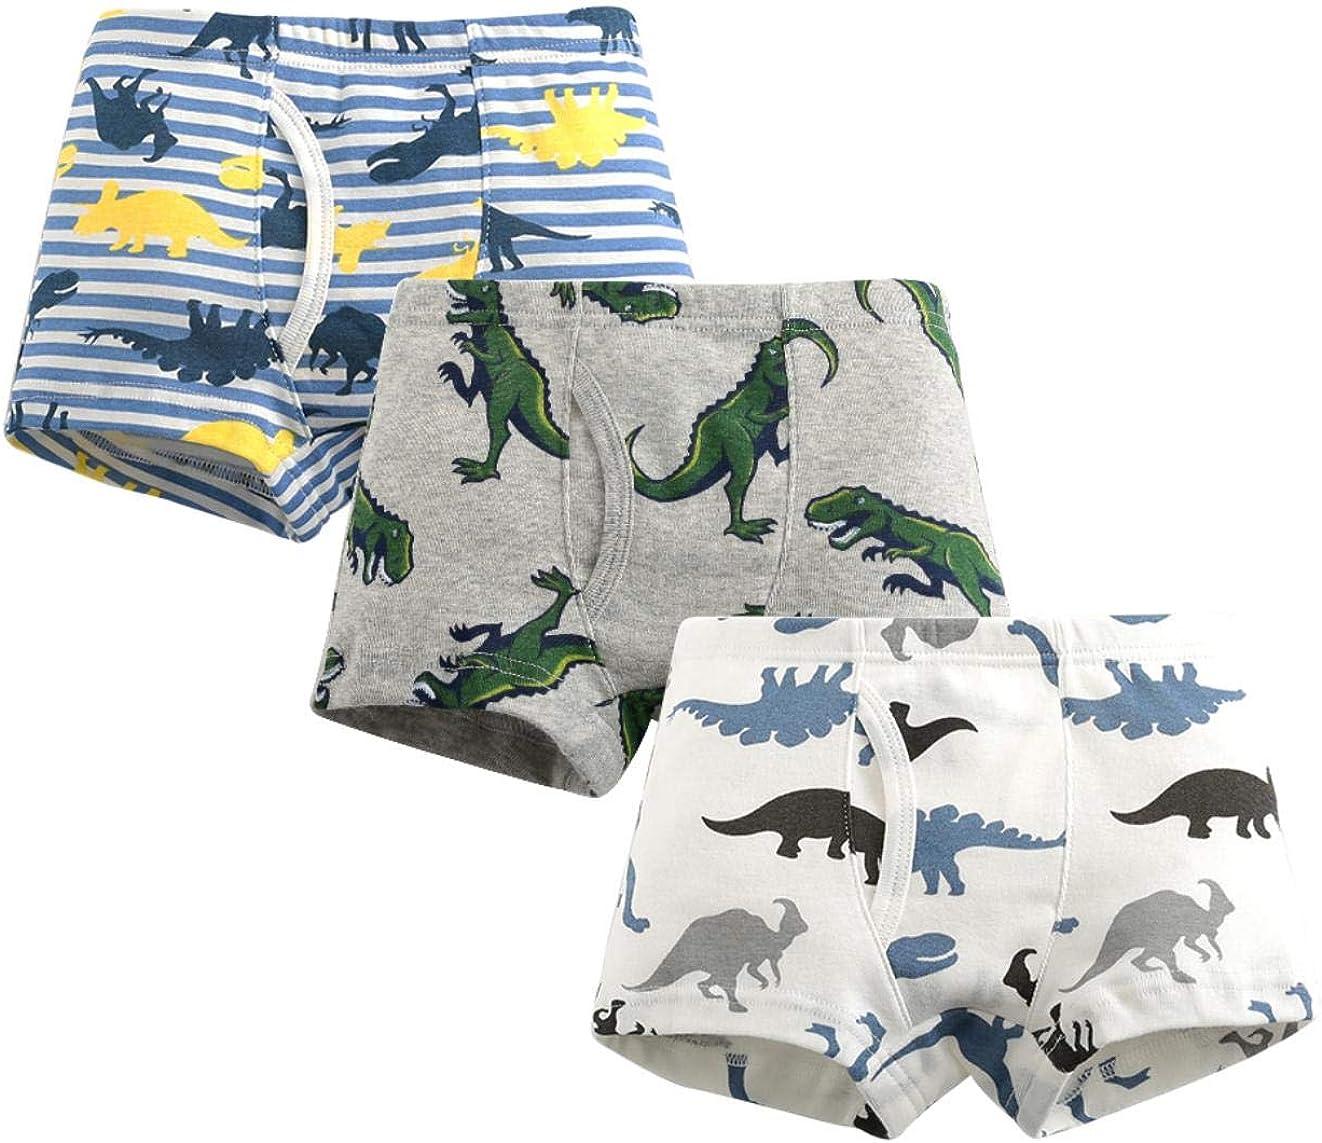 MIMY Boys Soft Cotton Boxer Briefs Toddler Kids Baby Underwear Dinosaur Truck Training Panty 3 Pack 3-10Y Black